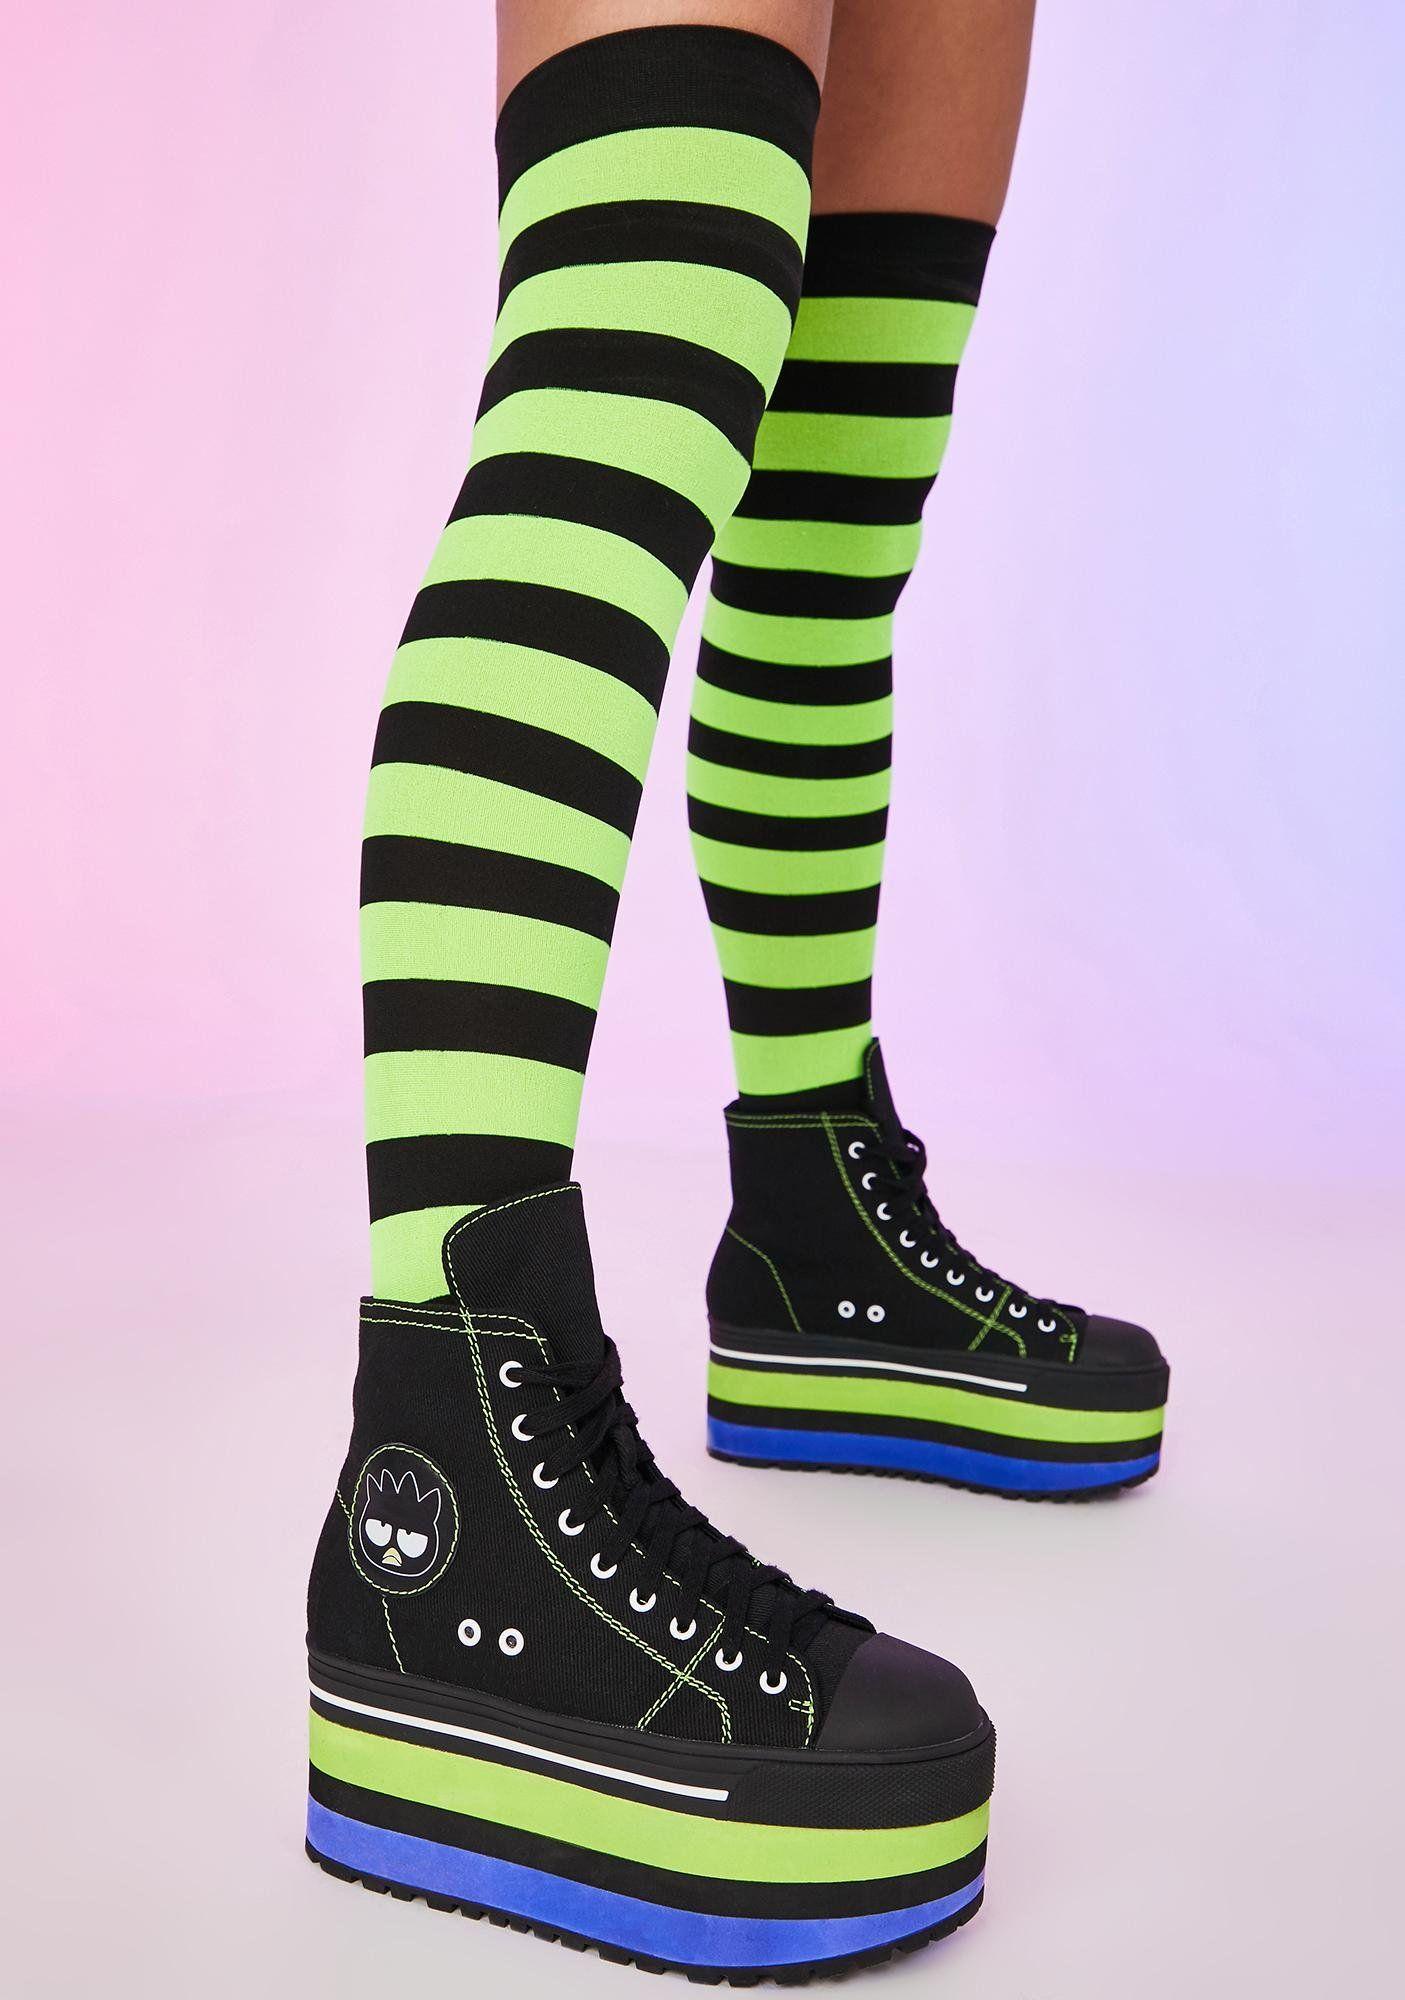 Platform sneakers, Sneakers, Creeper boots